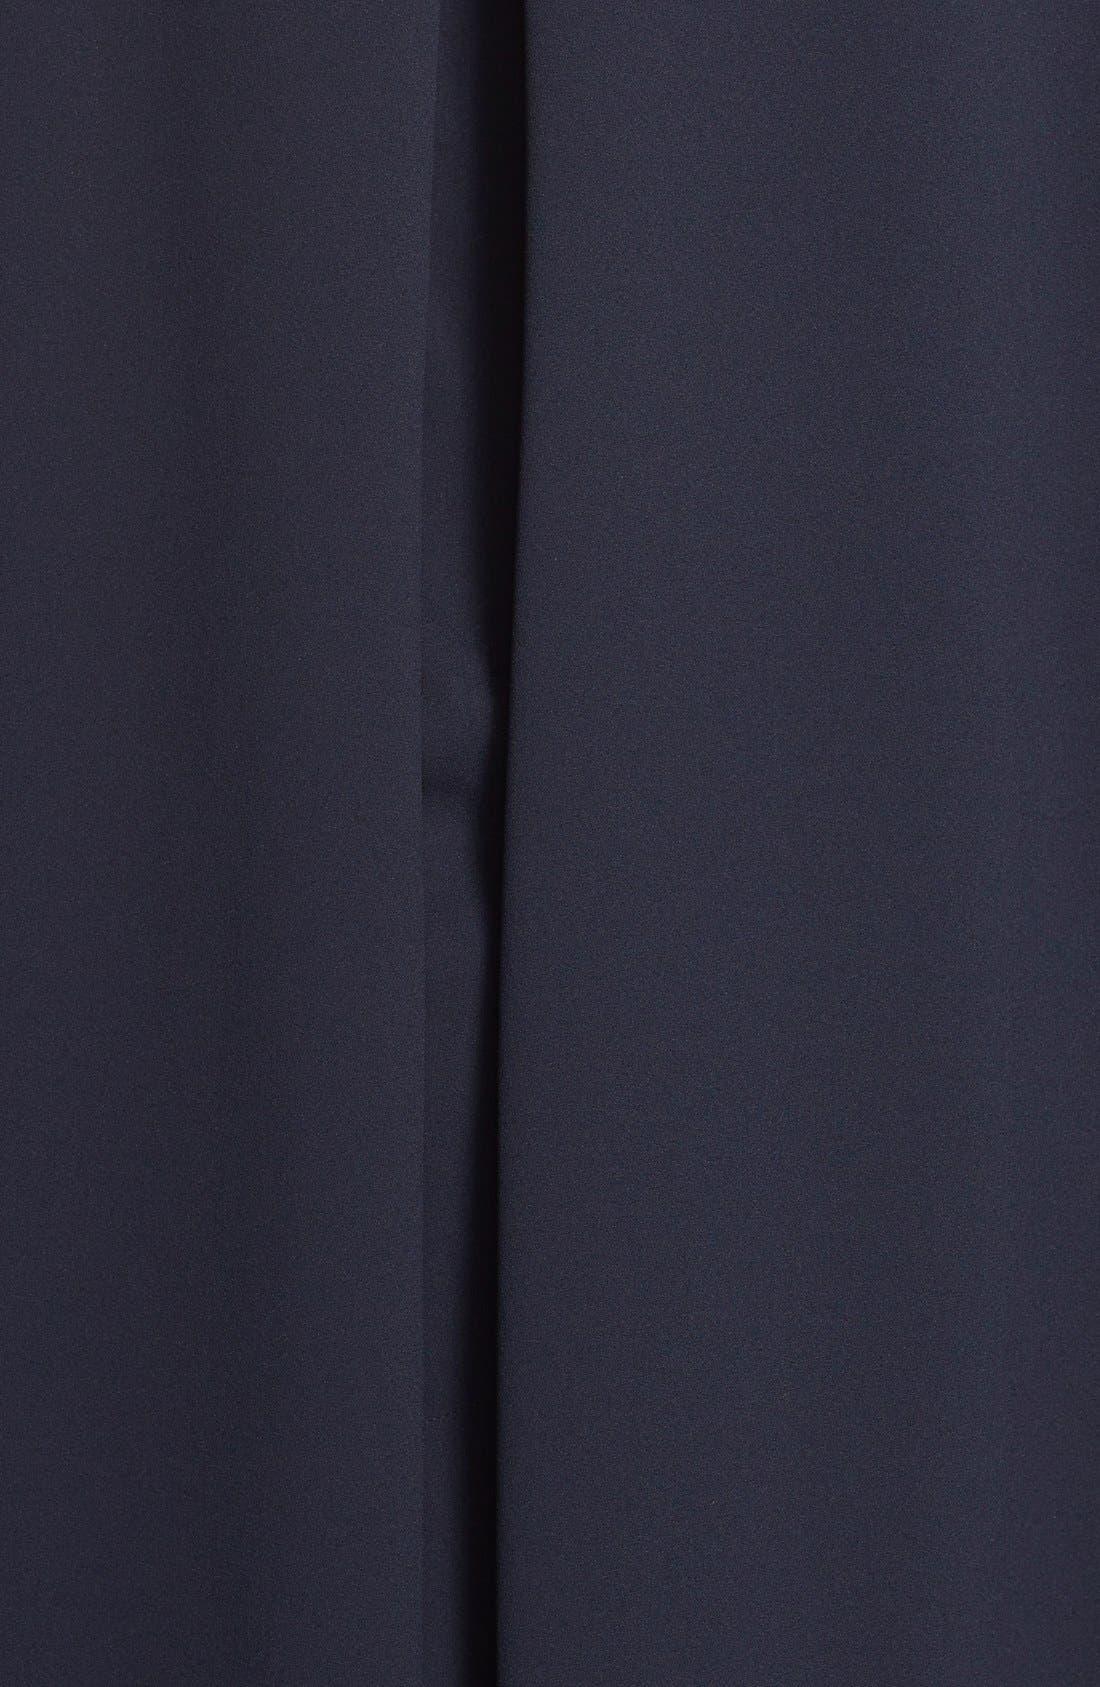 ADRIANNA PAPELL,                             Cape Sheath Dress,                             Alternate thumbnail 3, color,                             412